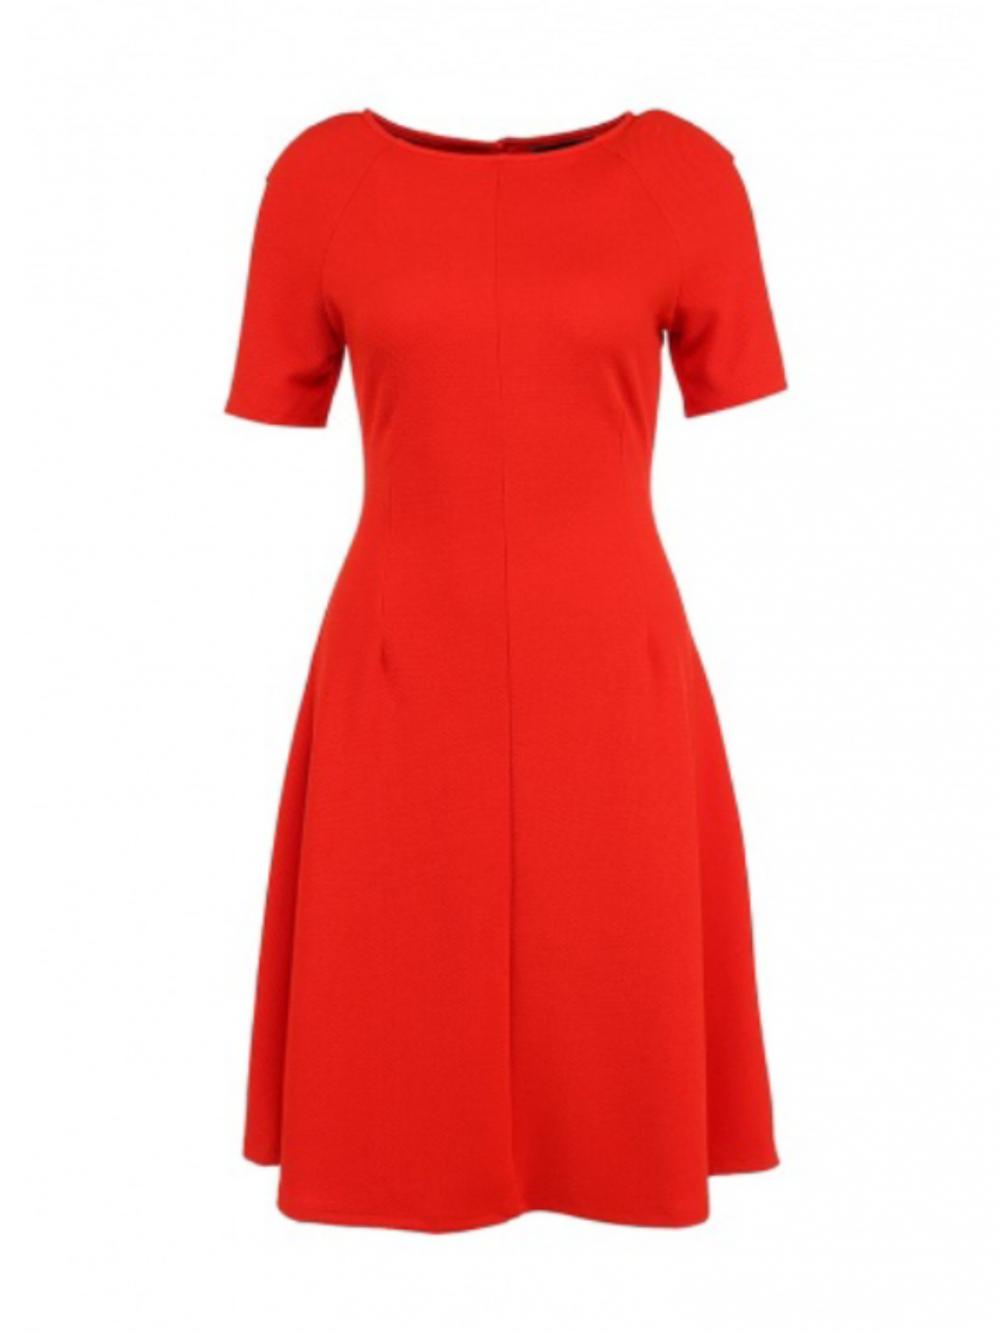 Платье Dorothy Perkins, маркировка 6 (UK), 34 (euro)